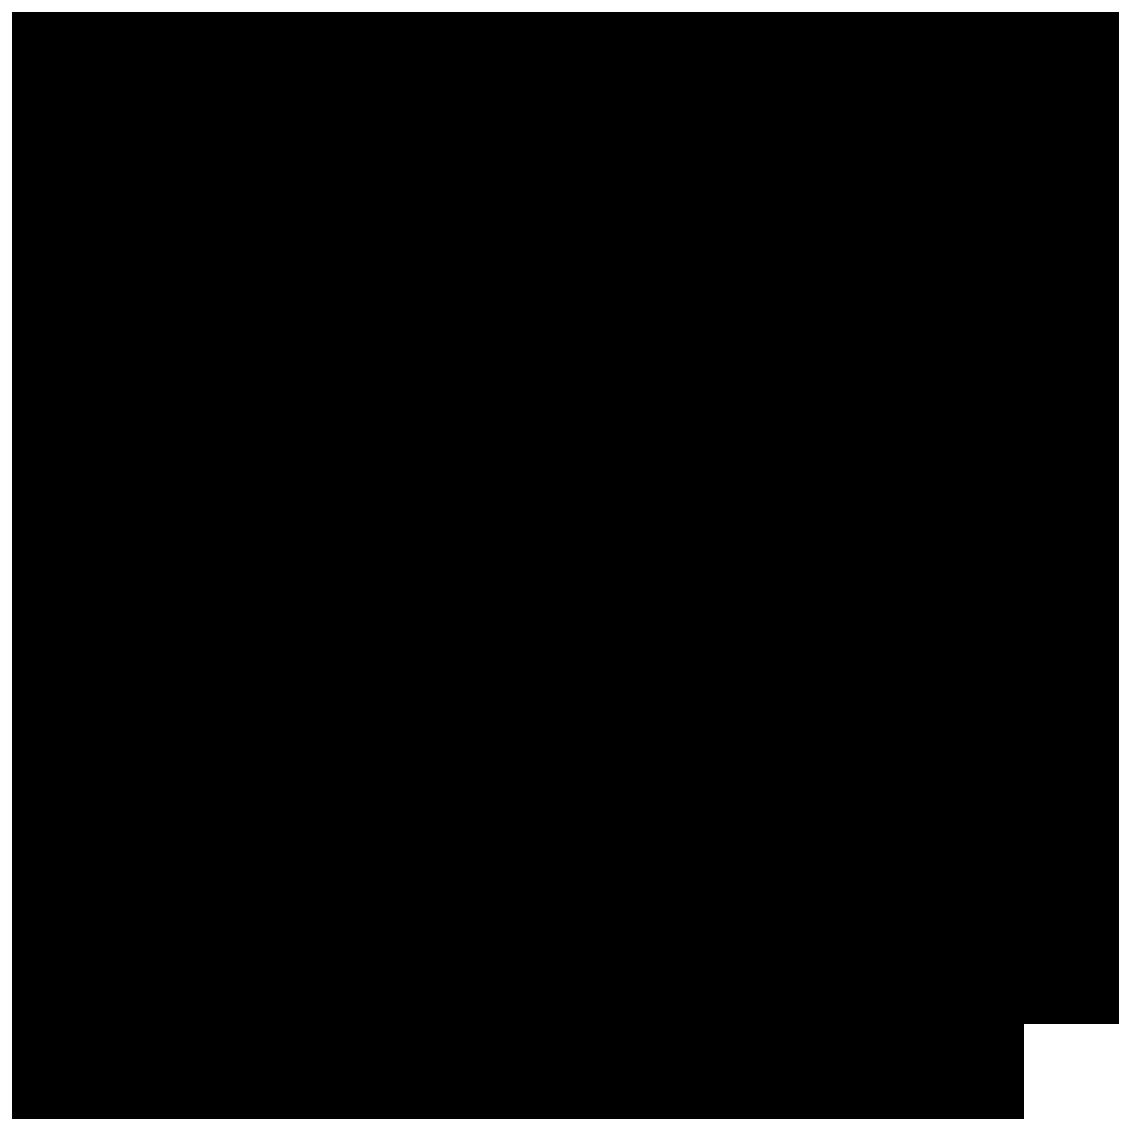 La sinergia di Hiya in Chiavegenetika